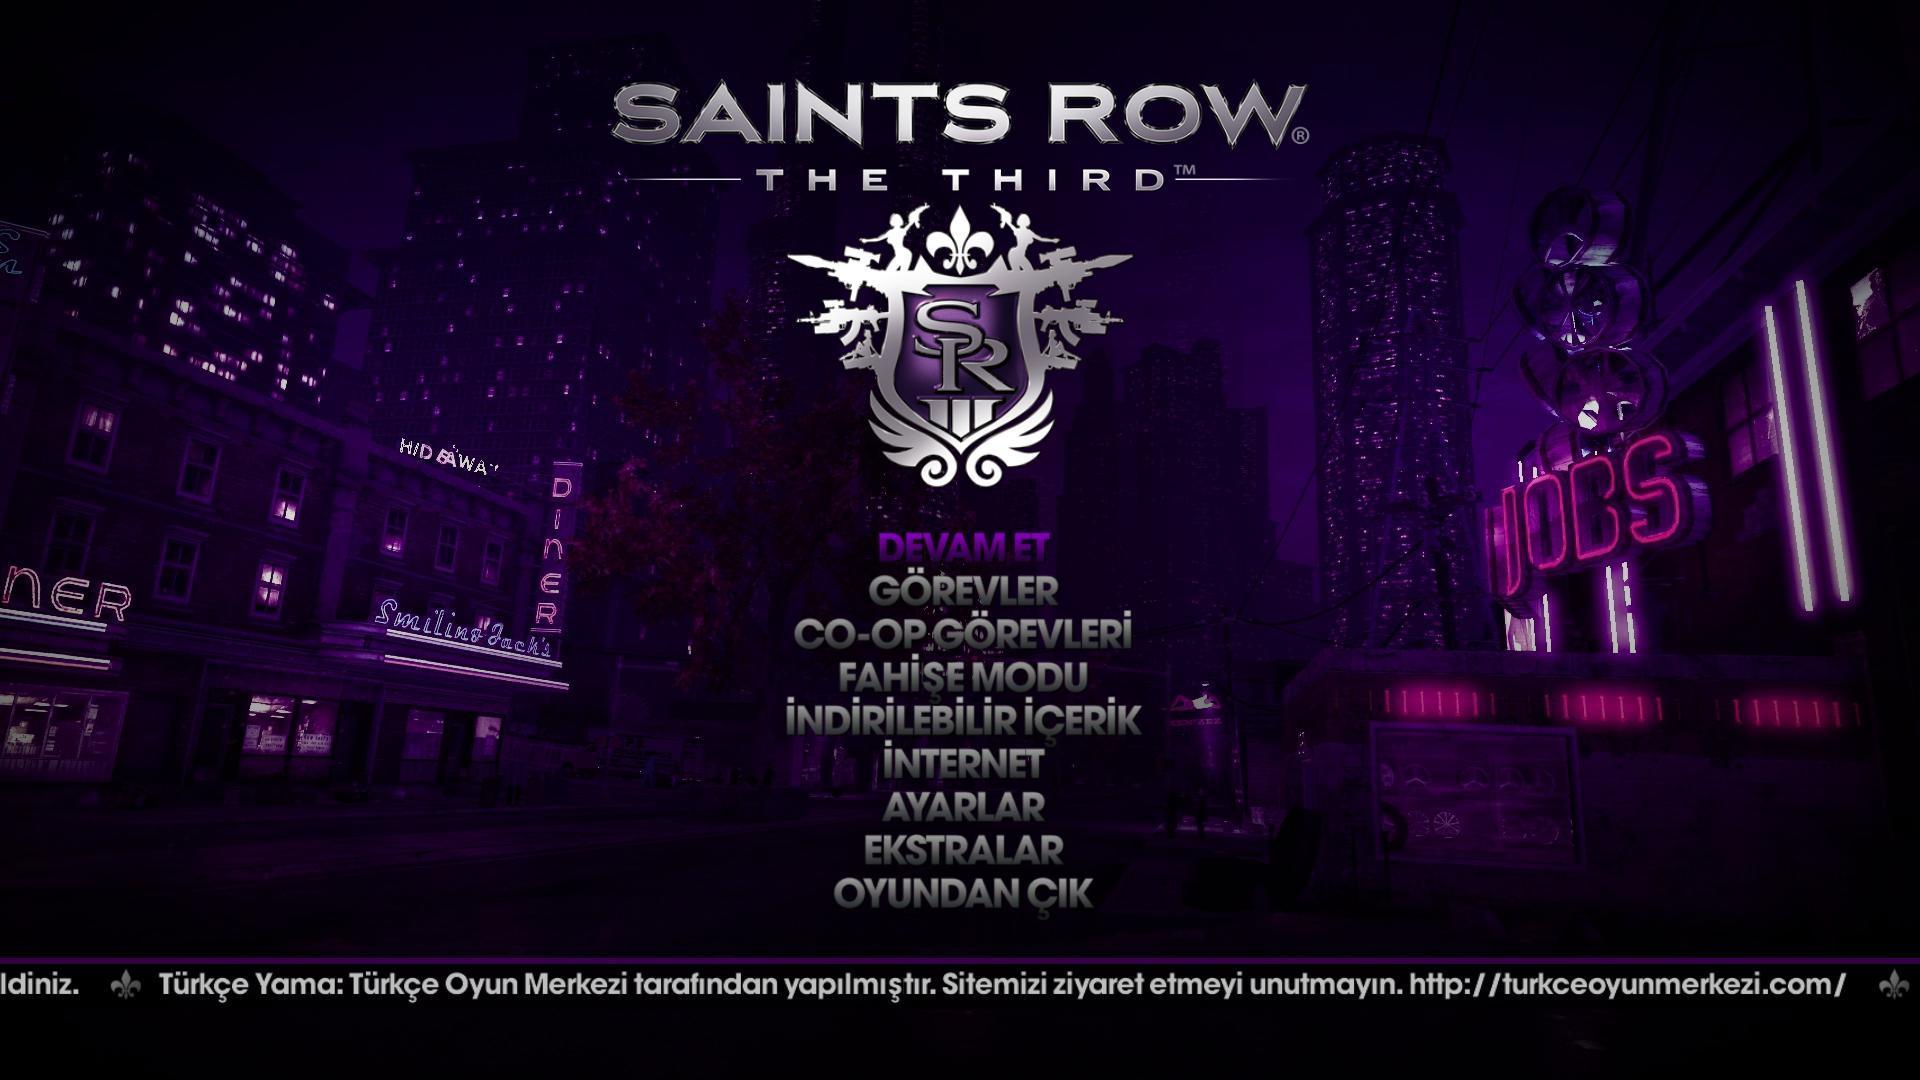 Saints Row The Third (3) % 100 Türkçe Yama